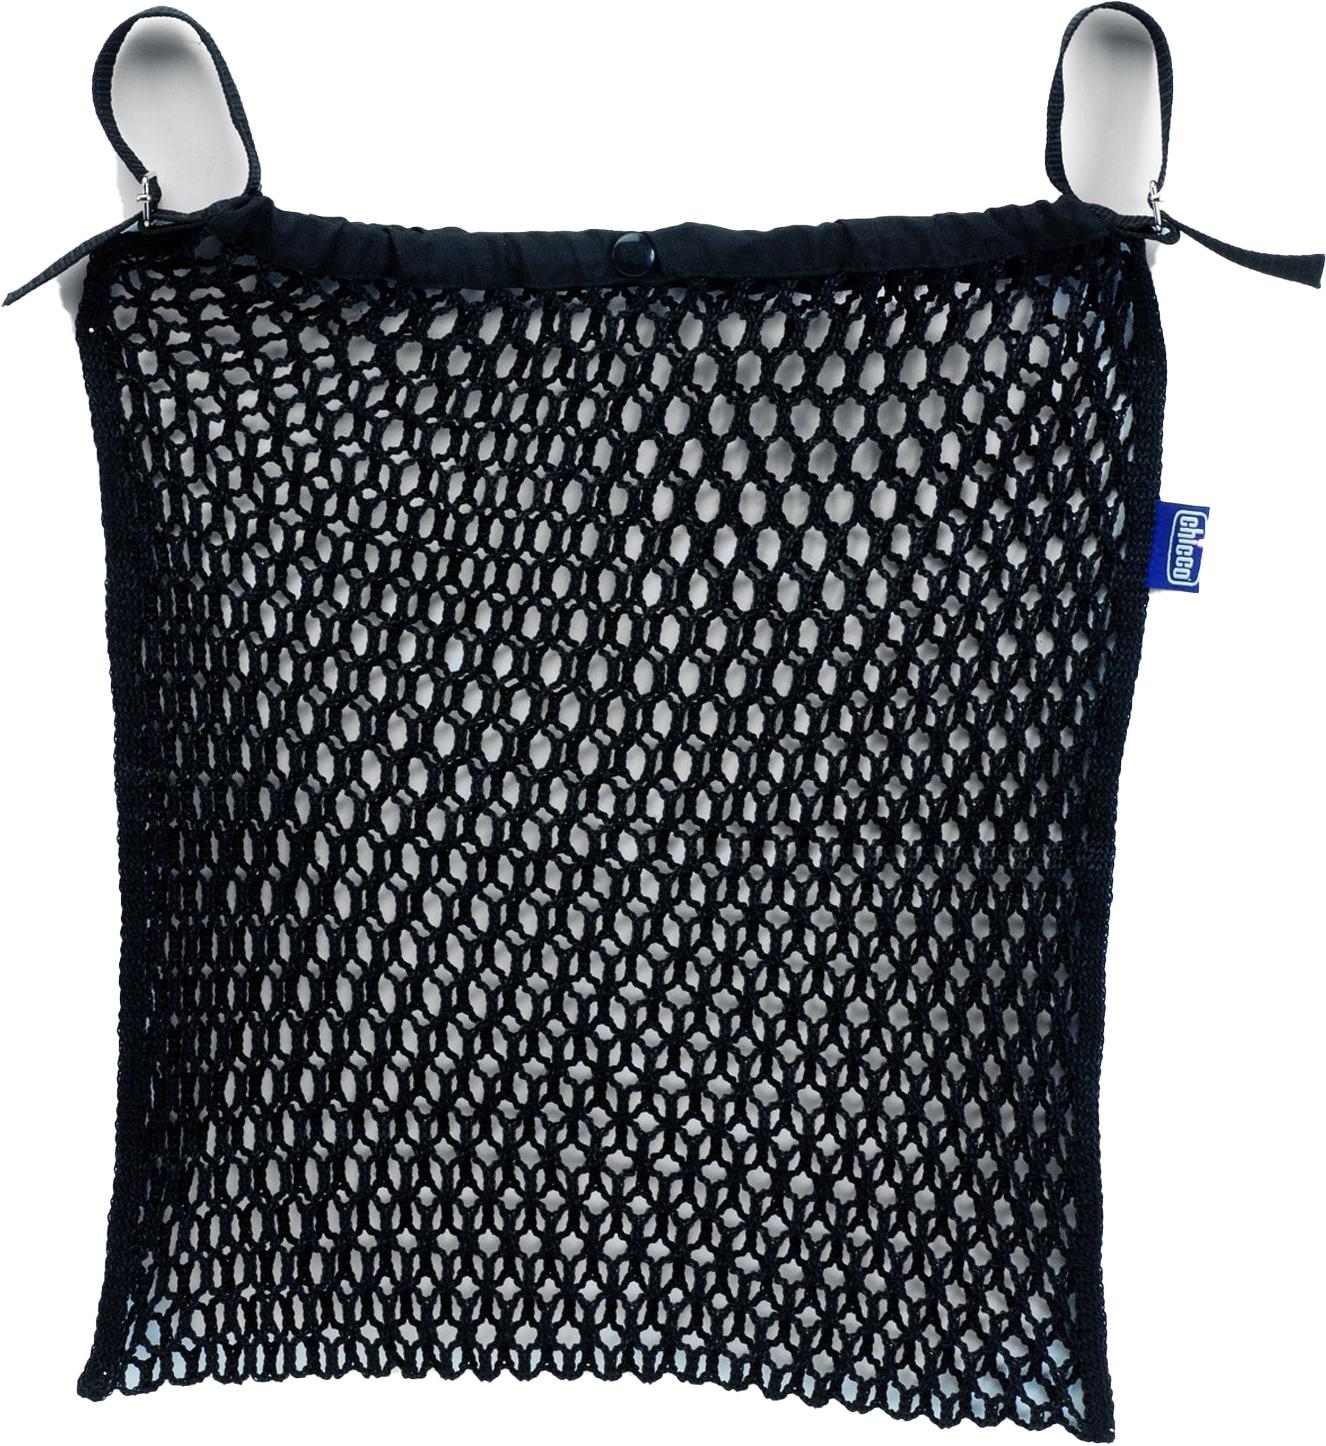 Аксессуар для колясок Chicco 89946 черный аксессуар для колясок chicco 67743 бежевый